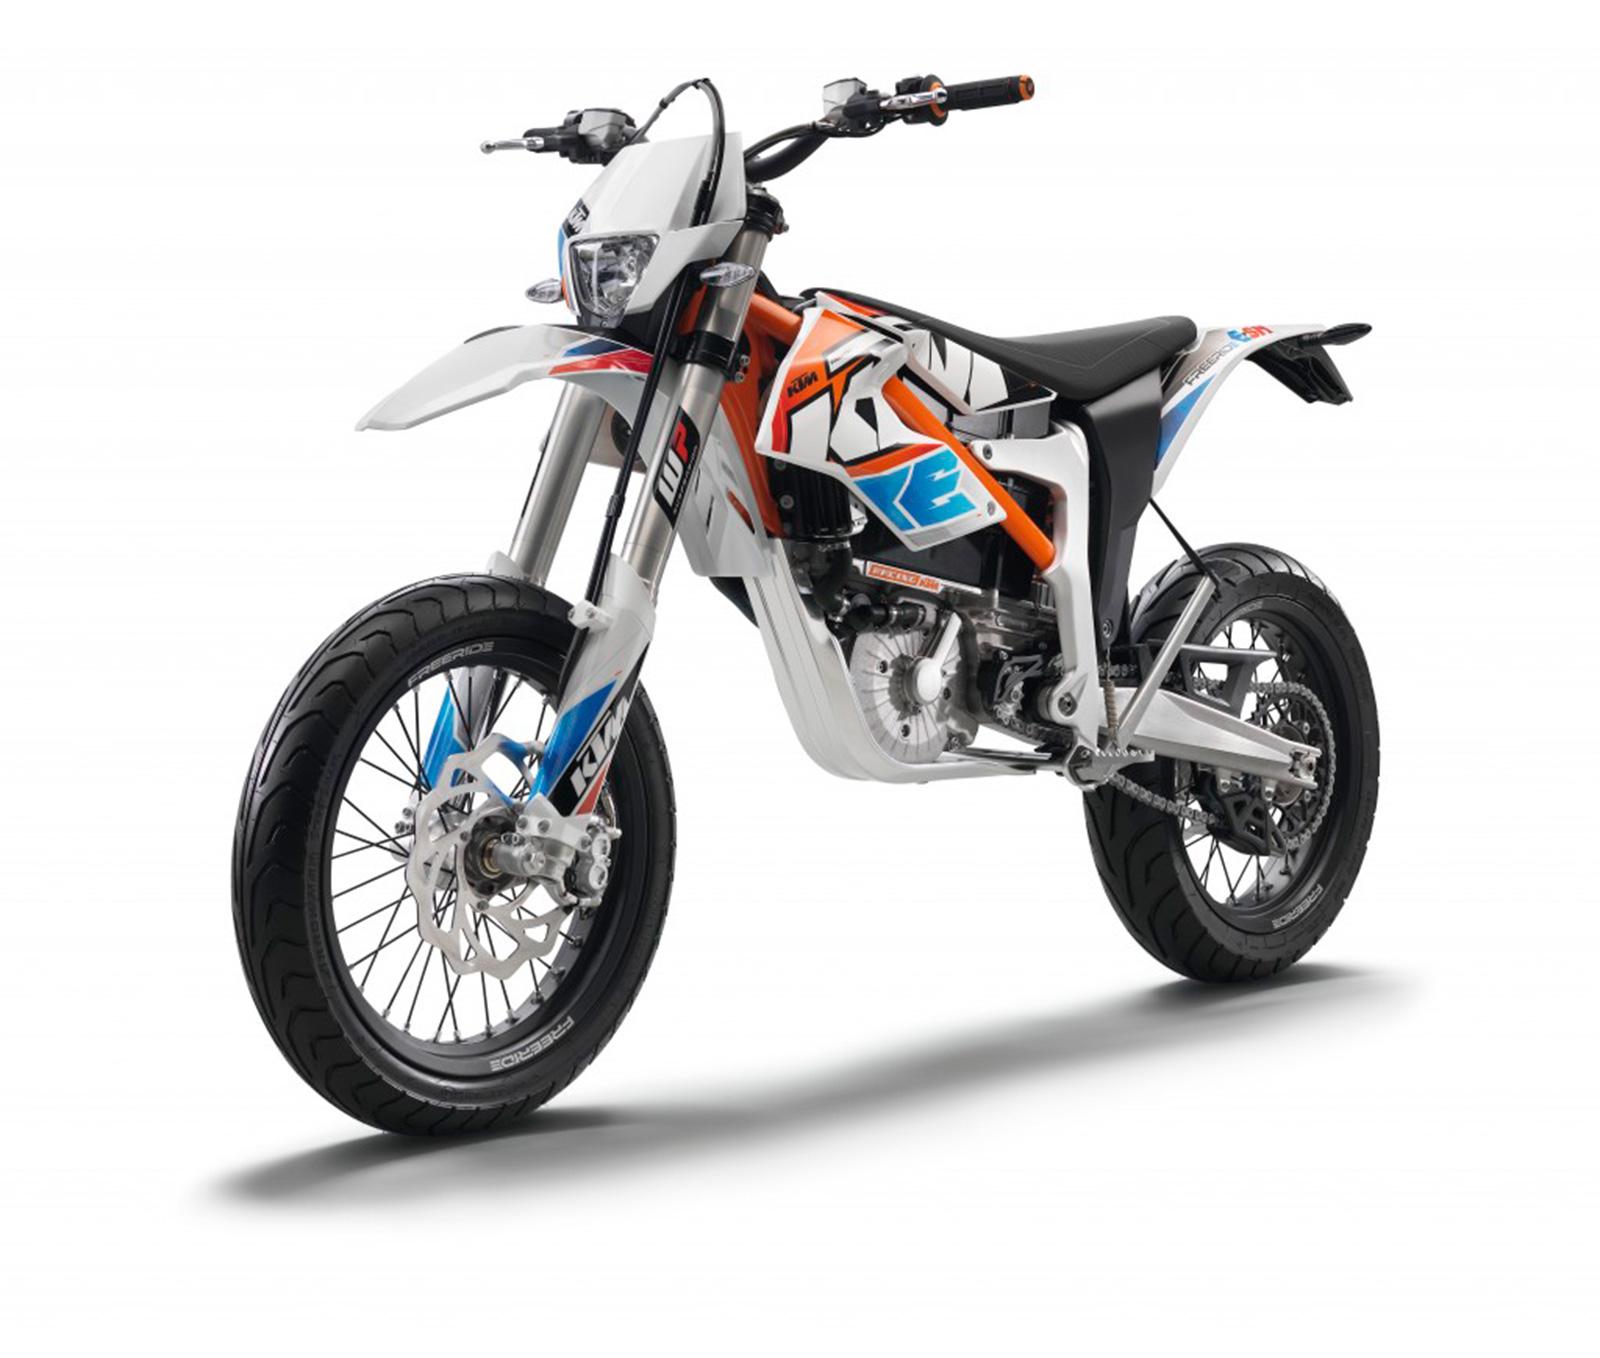 Ktm Freeride E Sm >> FOTO KTM FREERIDE E SM 2015 4